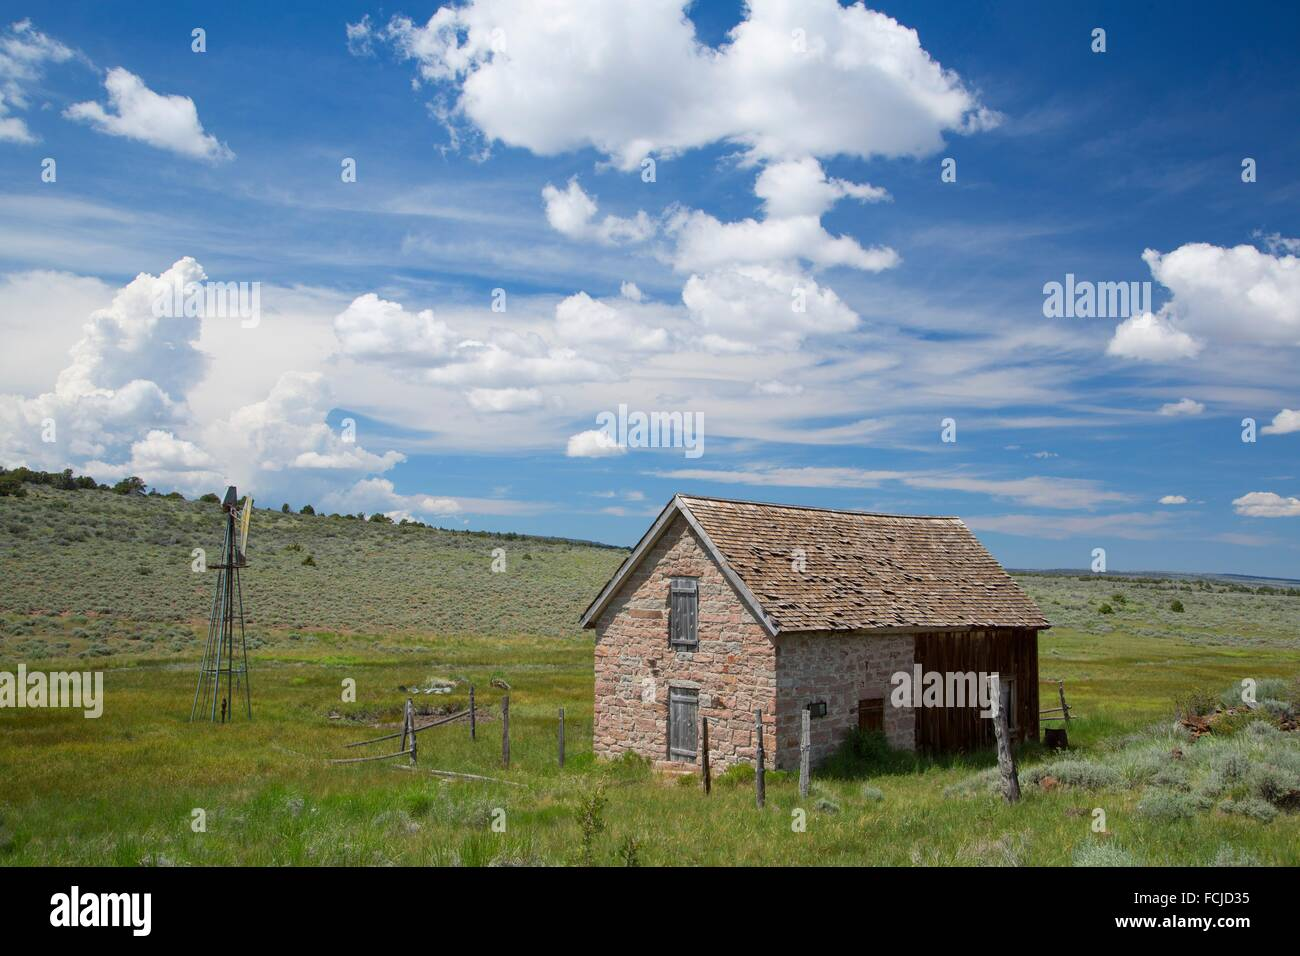 Last Chance Ranch, Sheldon National Wildlife Refuge, Nevada. - Stock Image